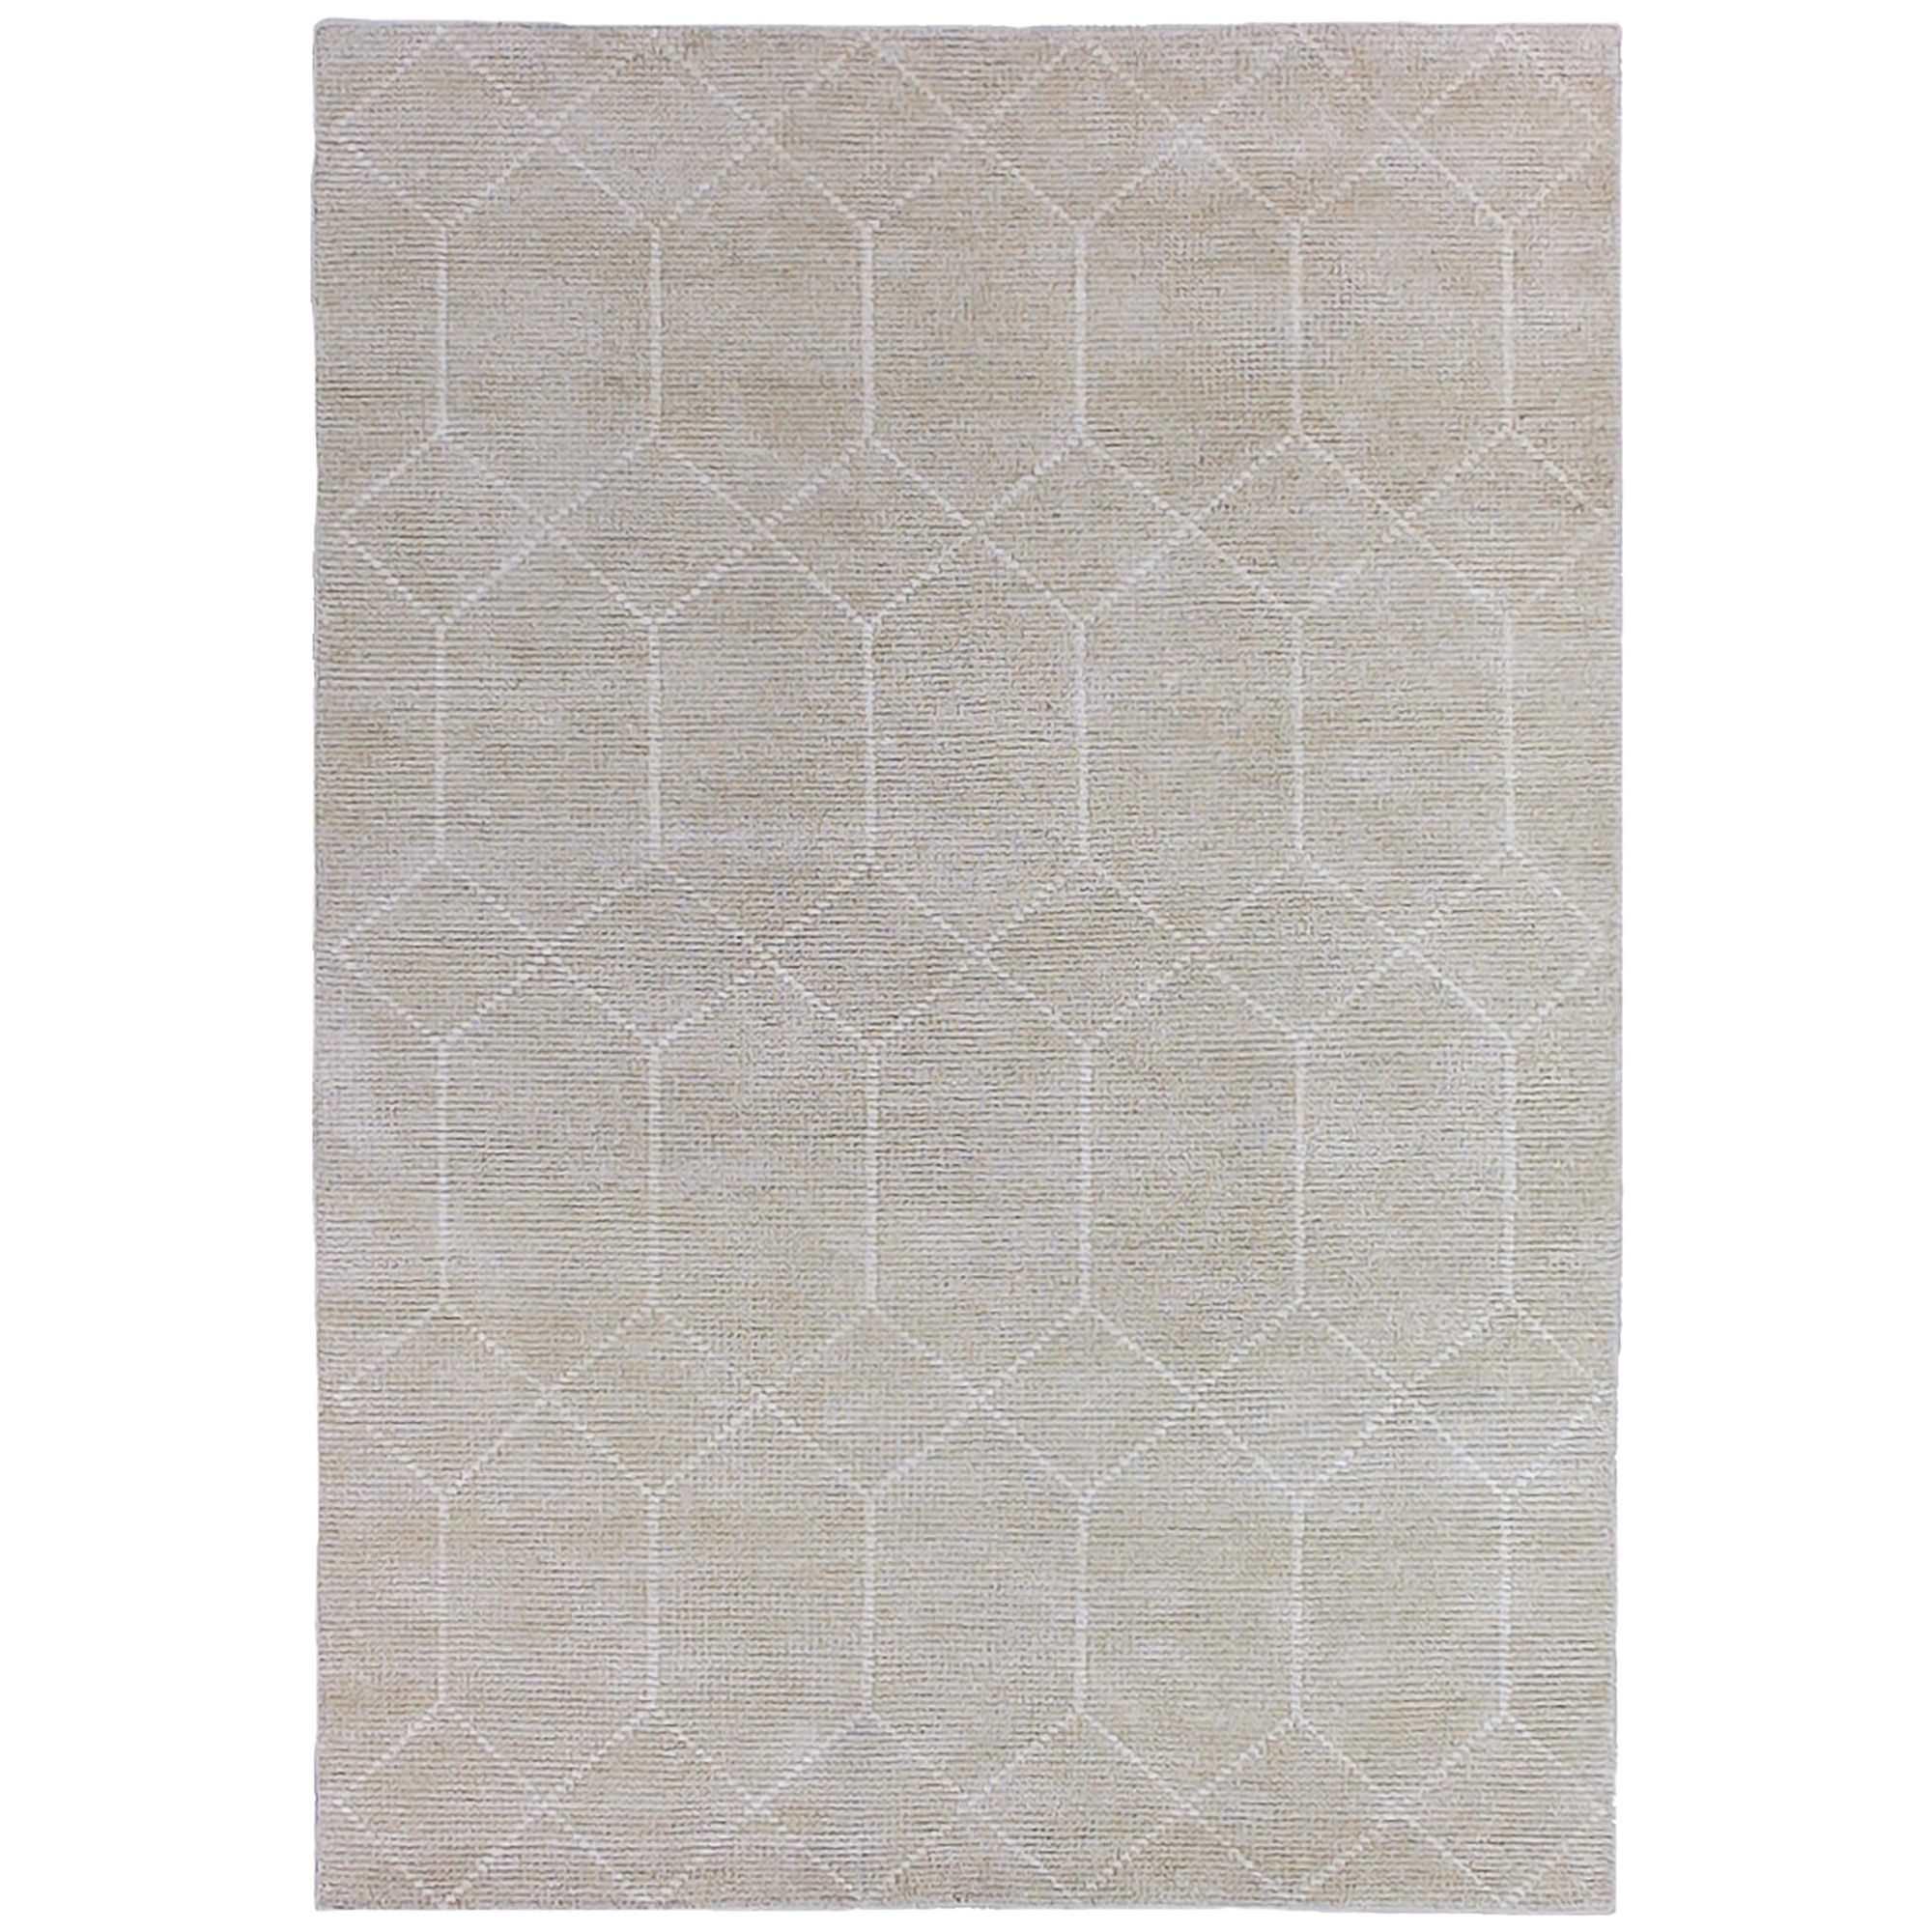 Geometrics Hand Knotted Wool Rug, 250x350cm, Silvery Beige